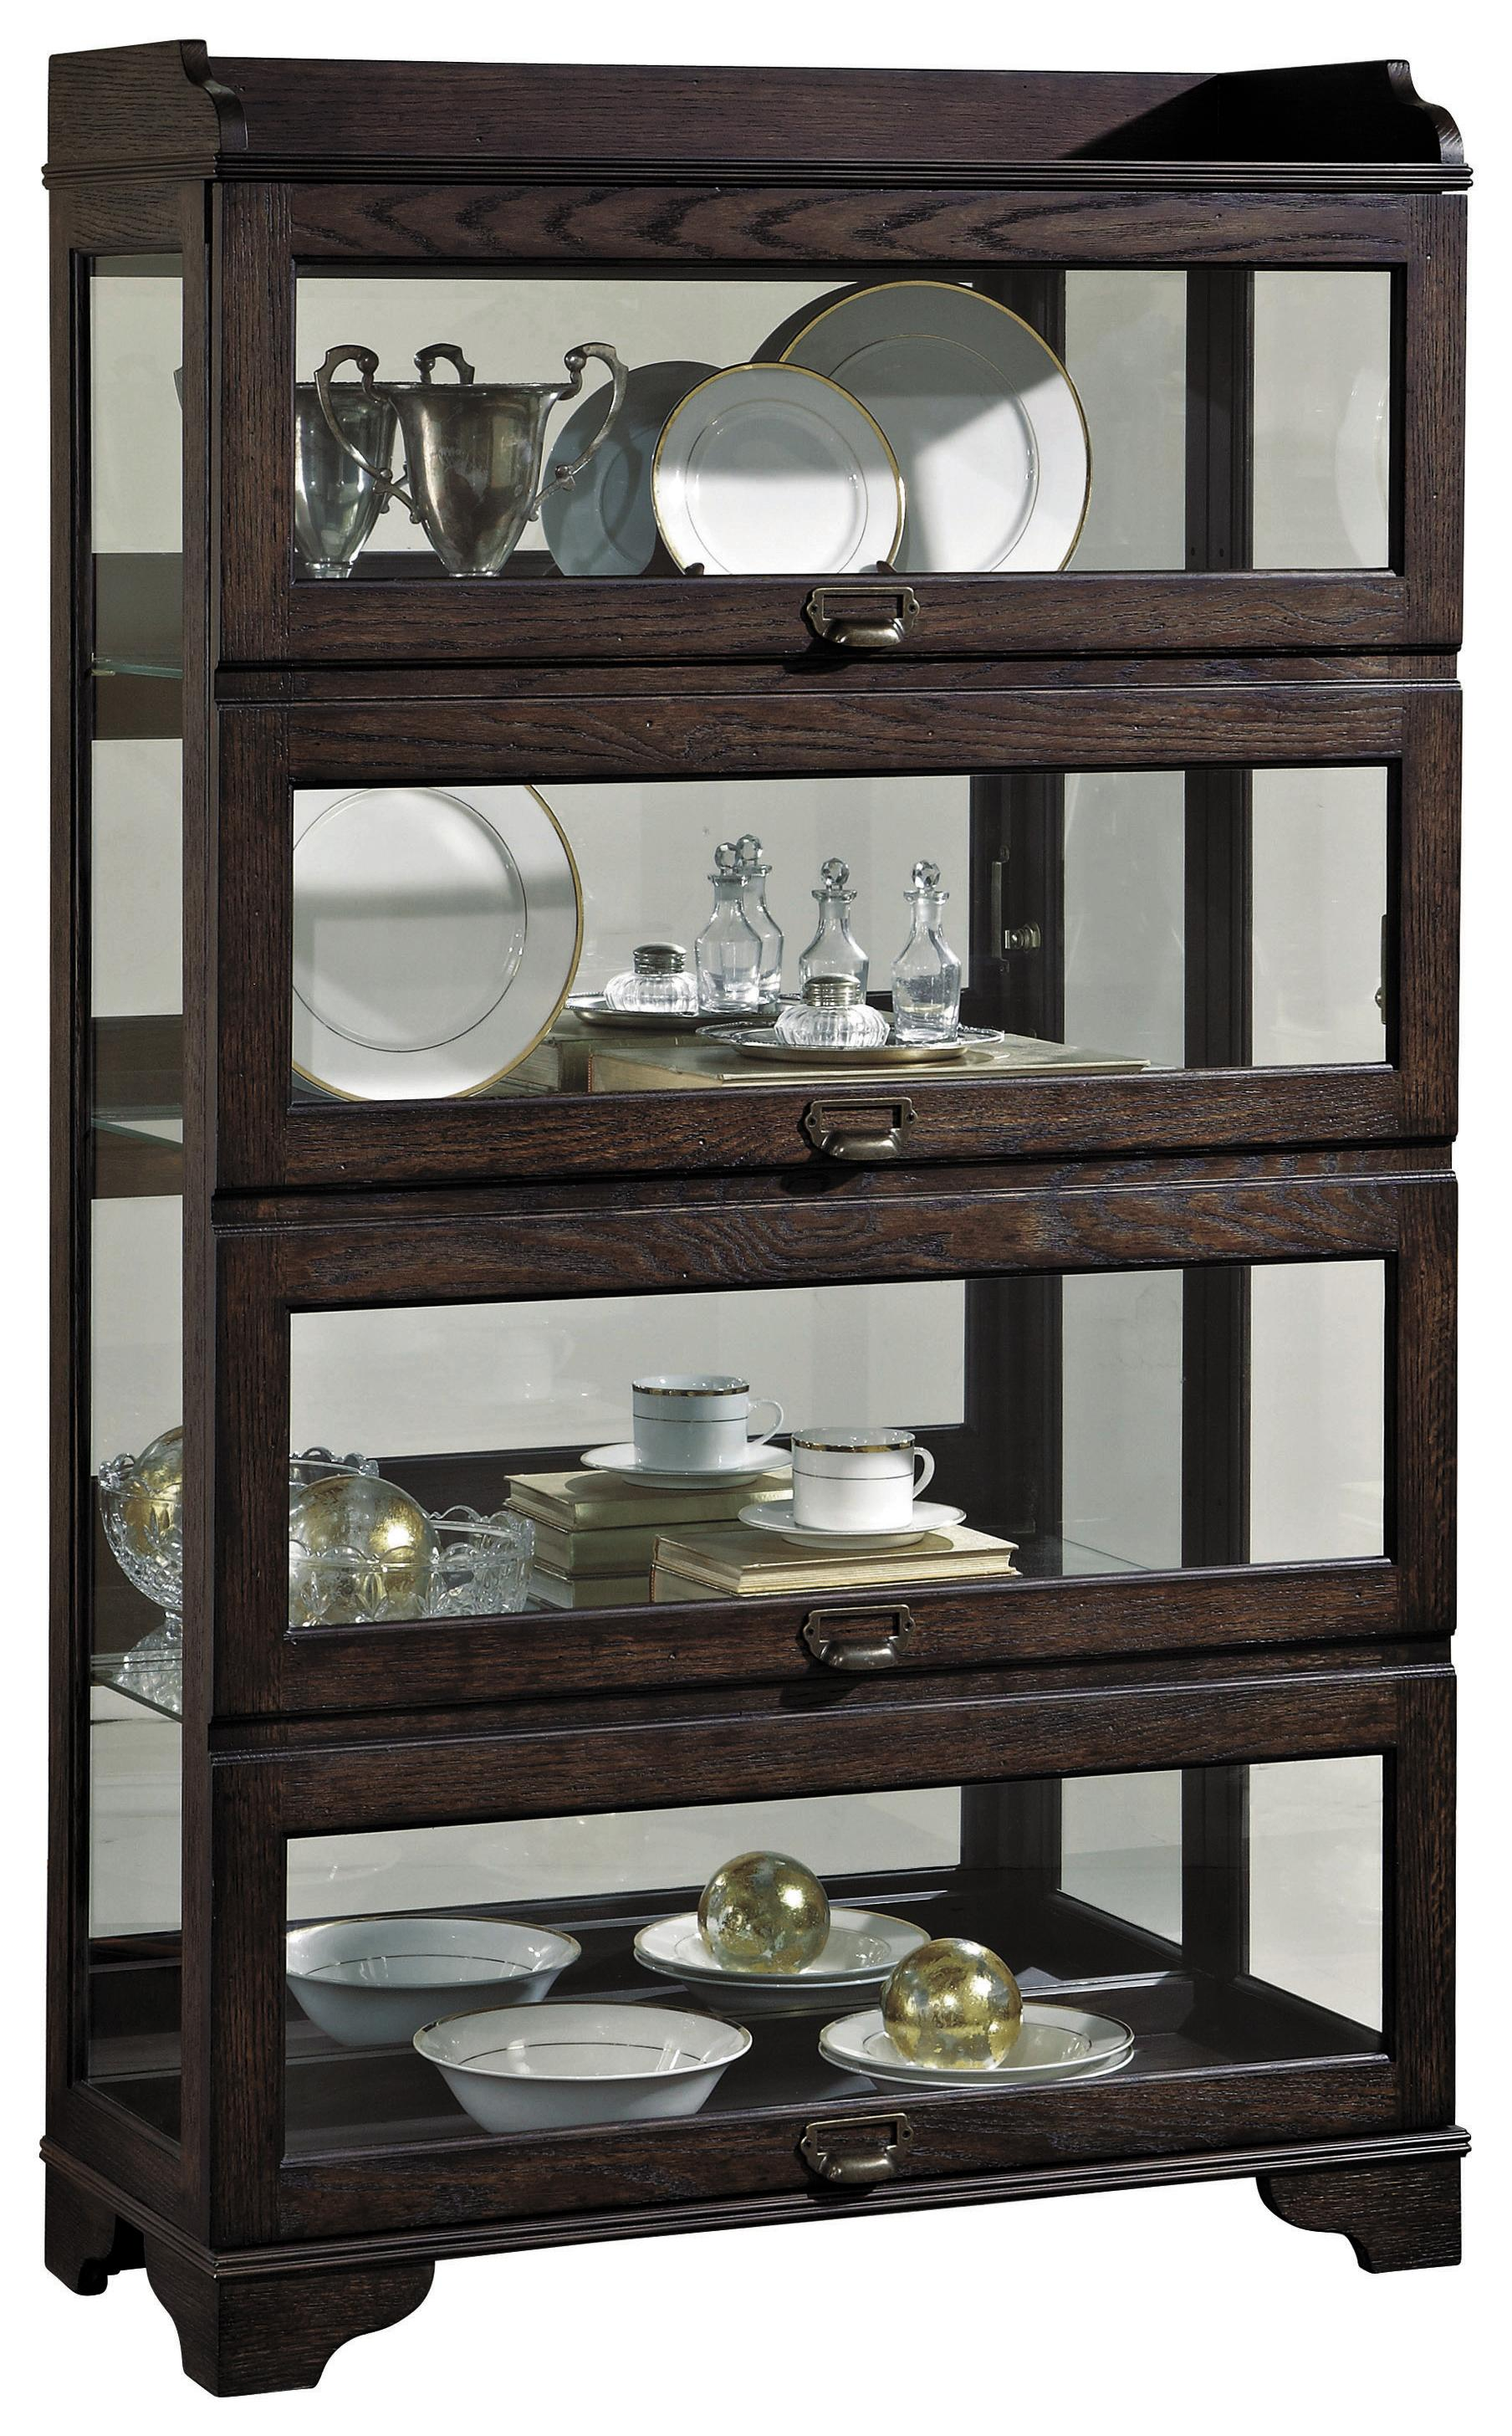 Pulaski furniture curios low sliding front curio olinde for Pulaski furniture